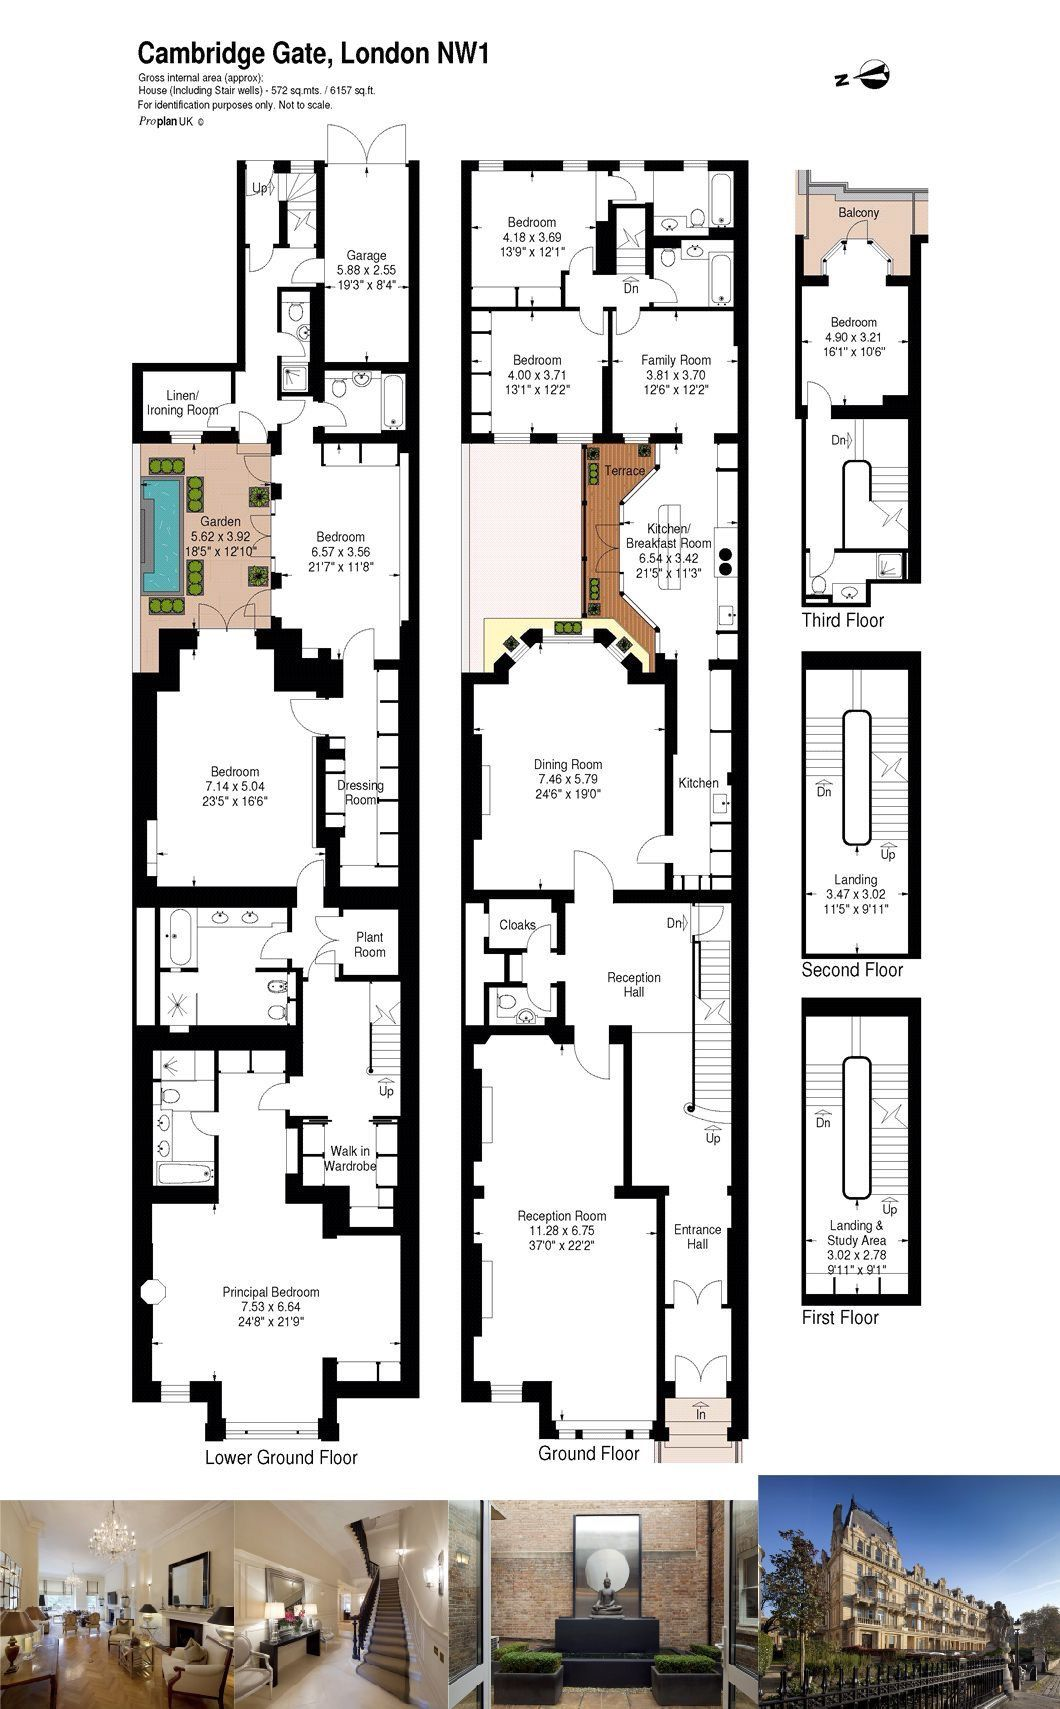 Cambridge Gate Regent S Park London Nw1 5 Bedroom Flat For Sale 45491578 Primelocation Mansion Floor Plan Apartment Floor Plans London Mansion